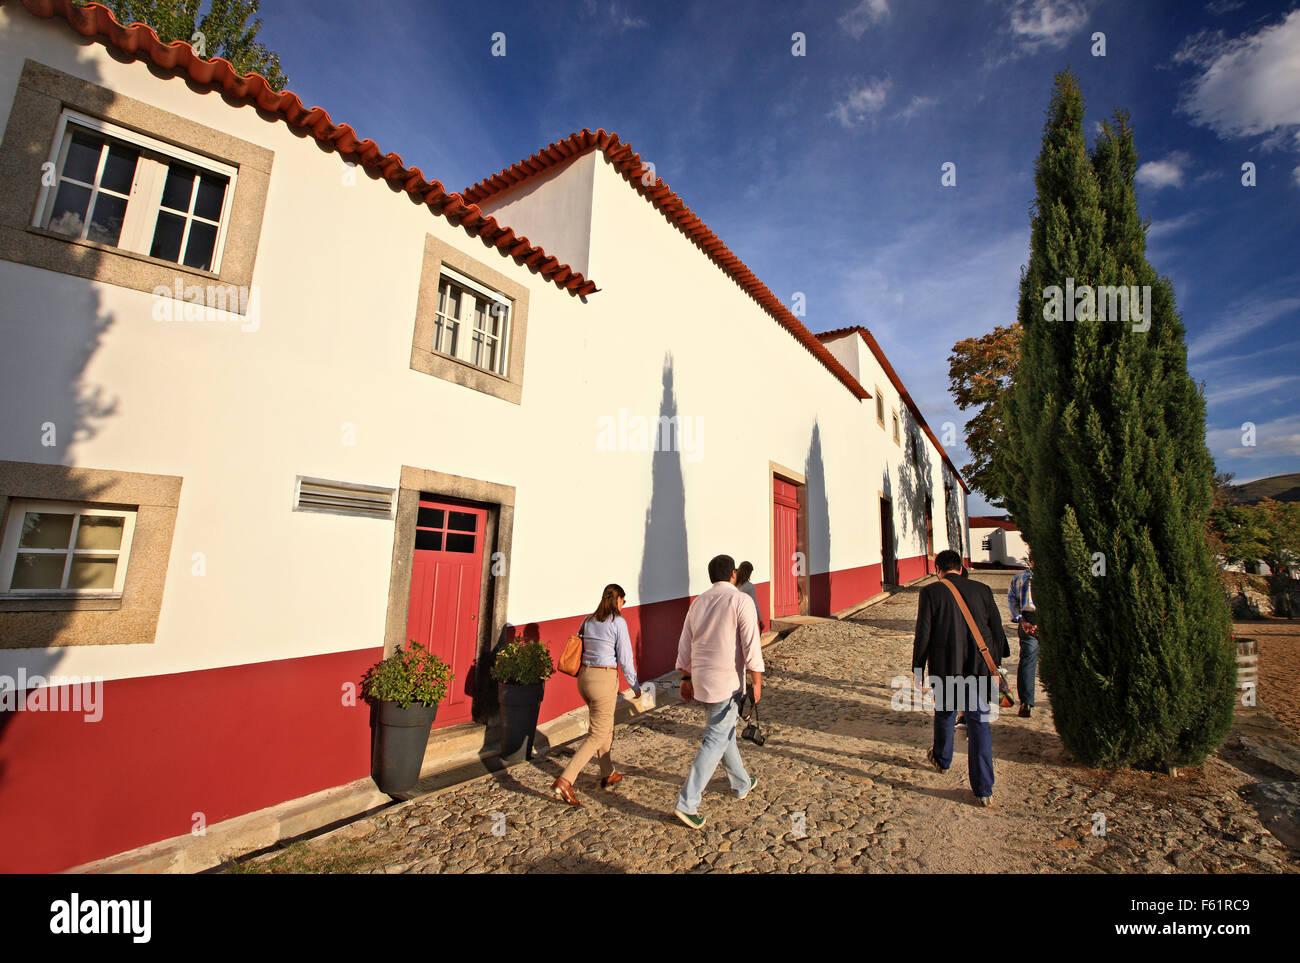 In Quinta Nova luxus Weingut Haus, eine schöne Pension im Douro Tal, Porto e Norte, Portugal. Stockbild